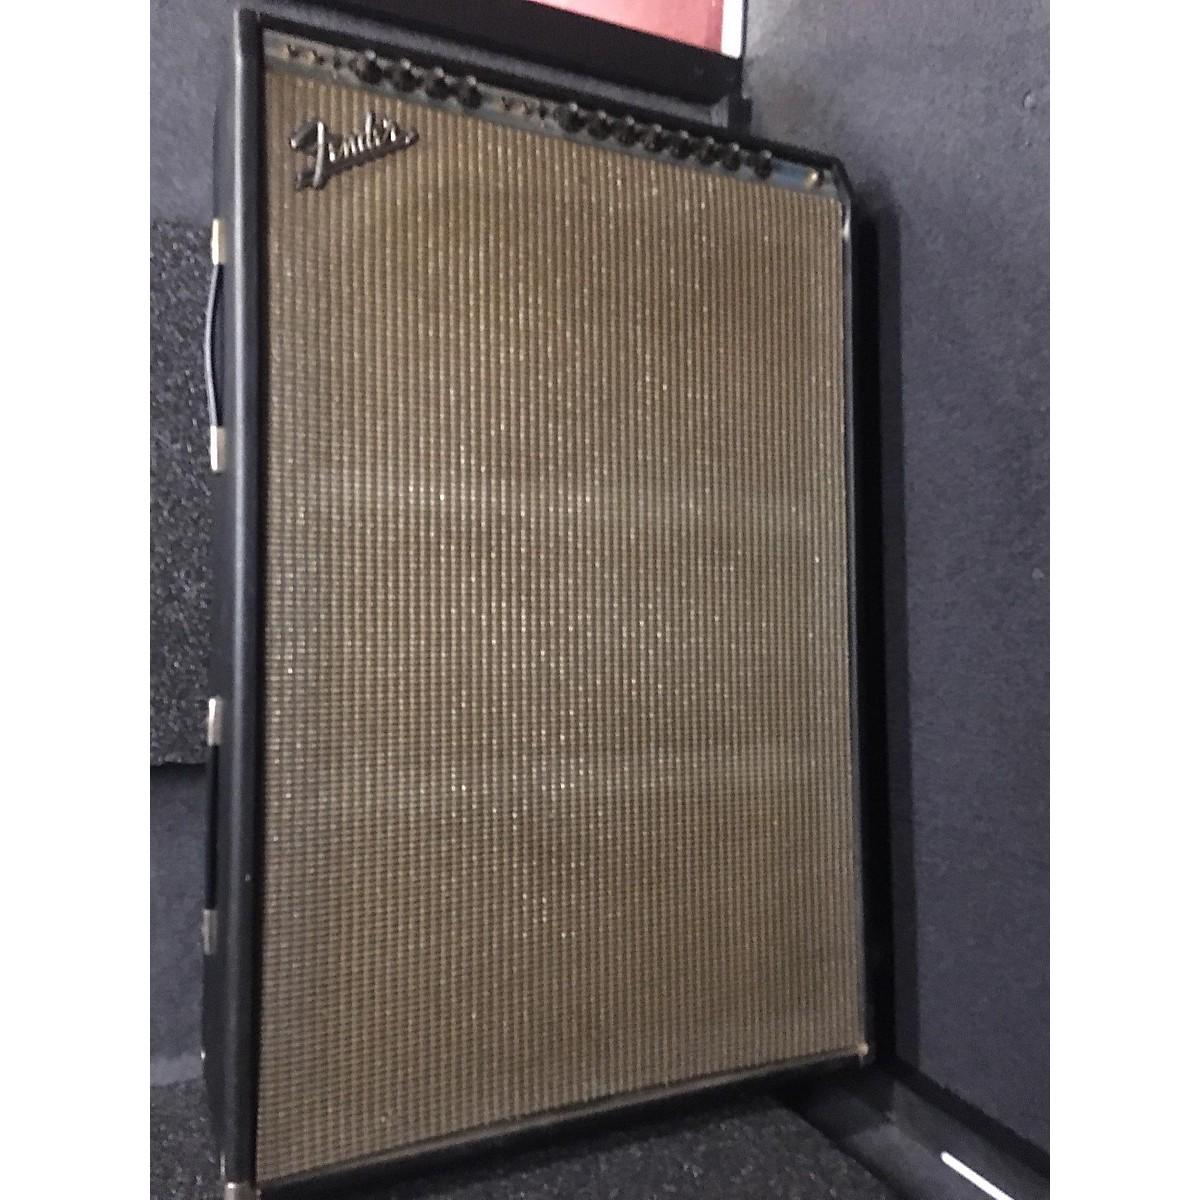 Fender 1972 Super Six Reverb Tube Guitar Combo Amp